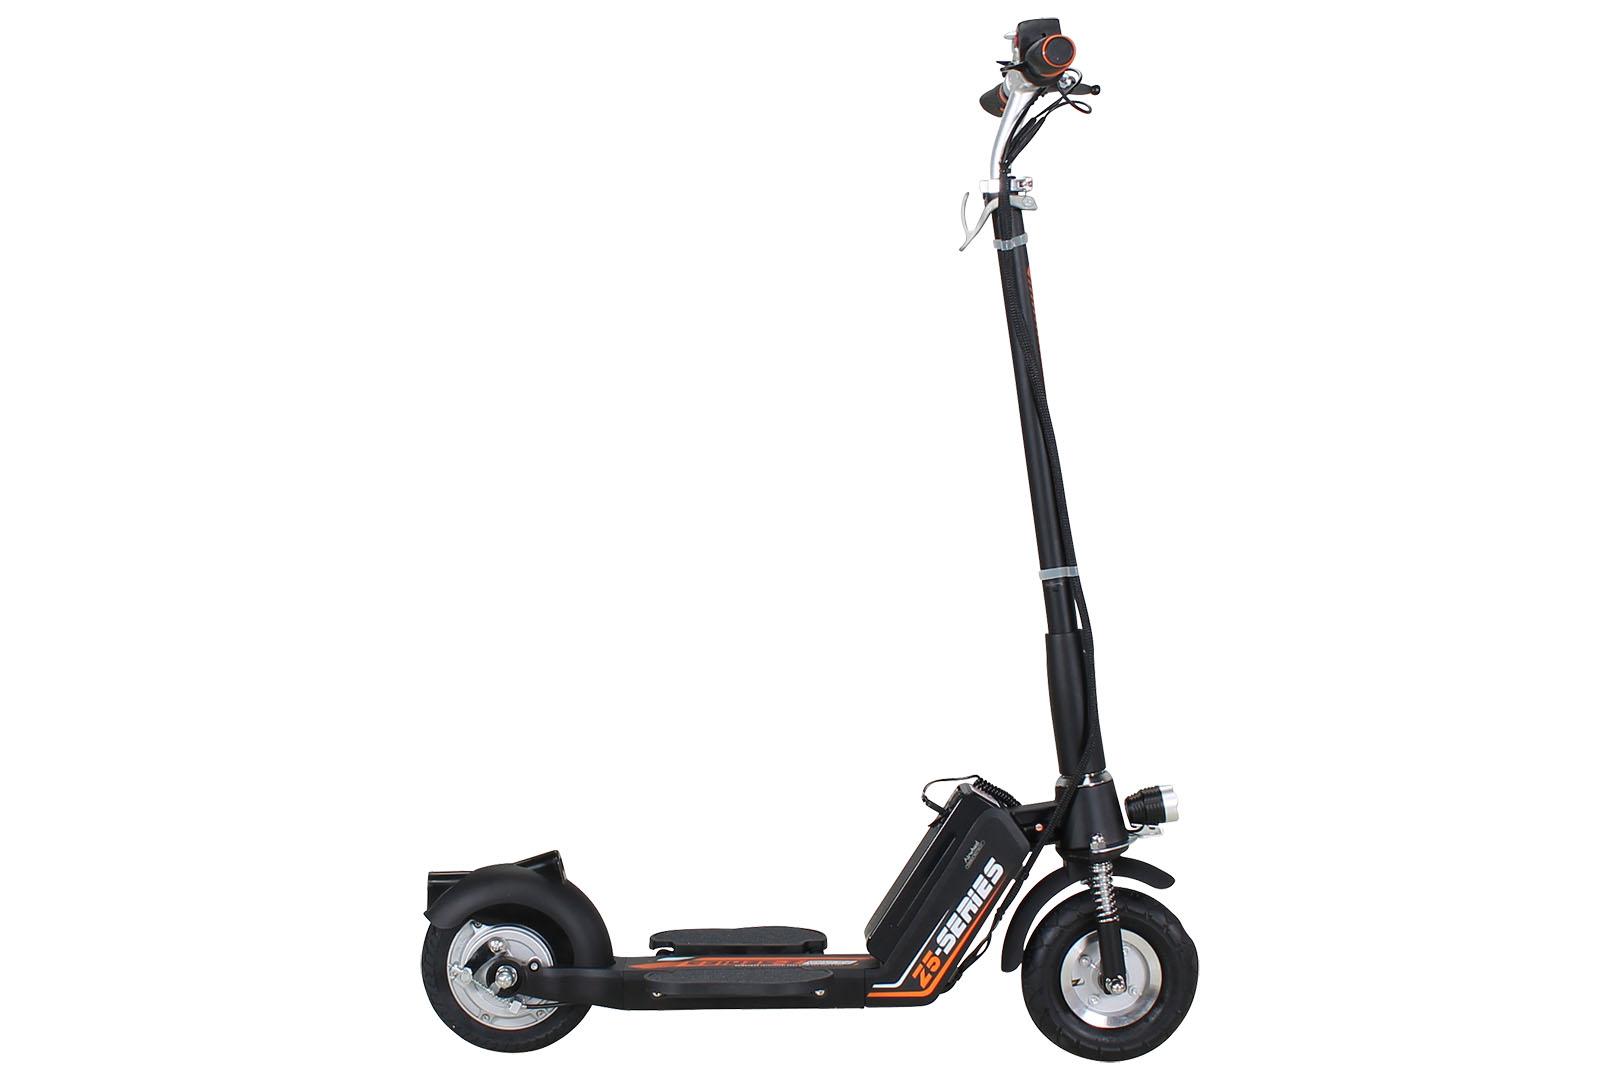 Airwheel z5 pliable aluminium e scooter trottinette lectrique scooter city - E scooter trottinette electrique ...